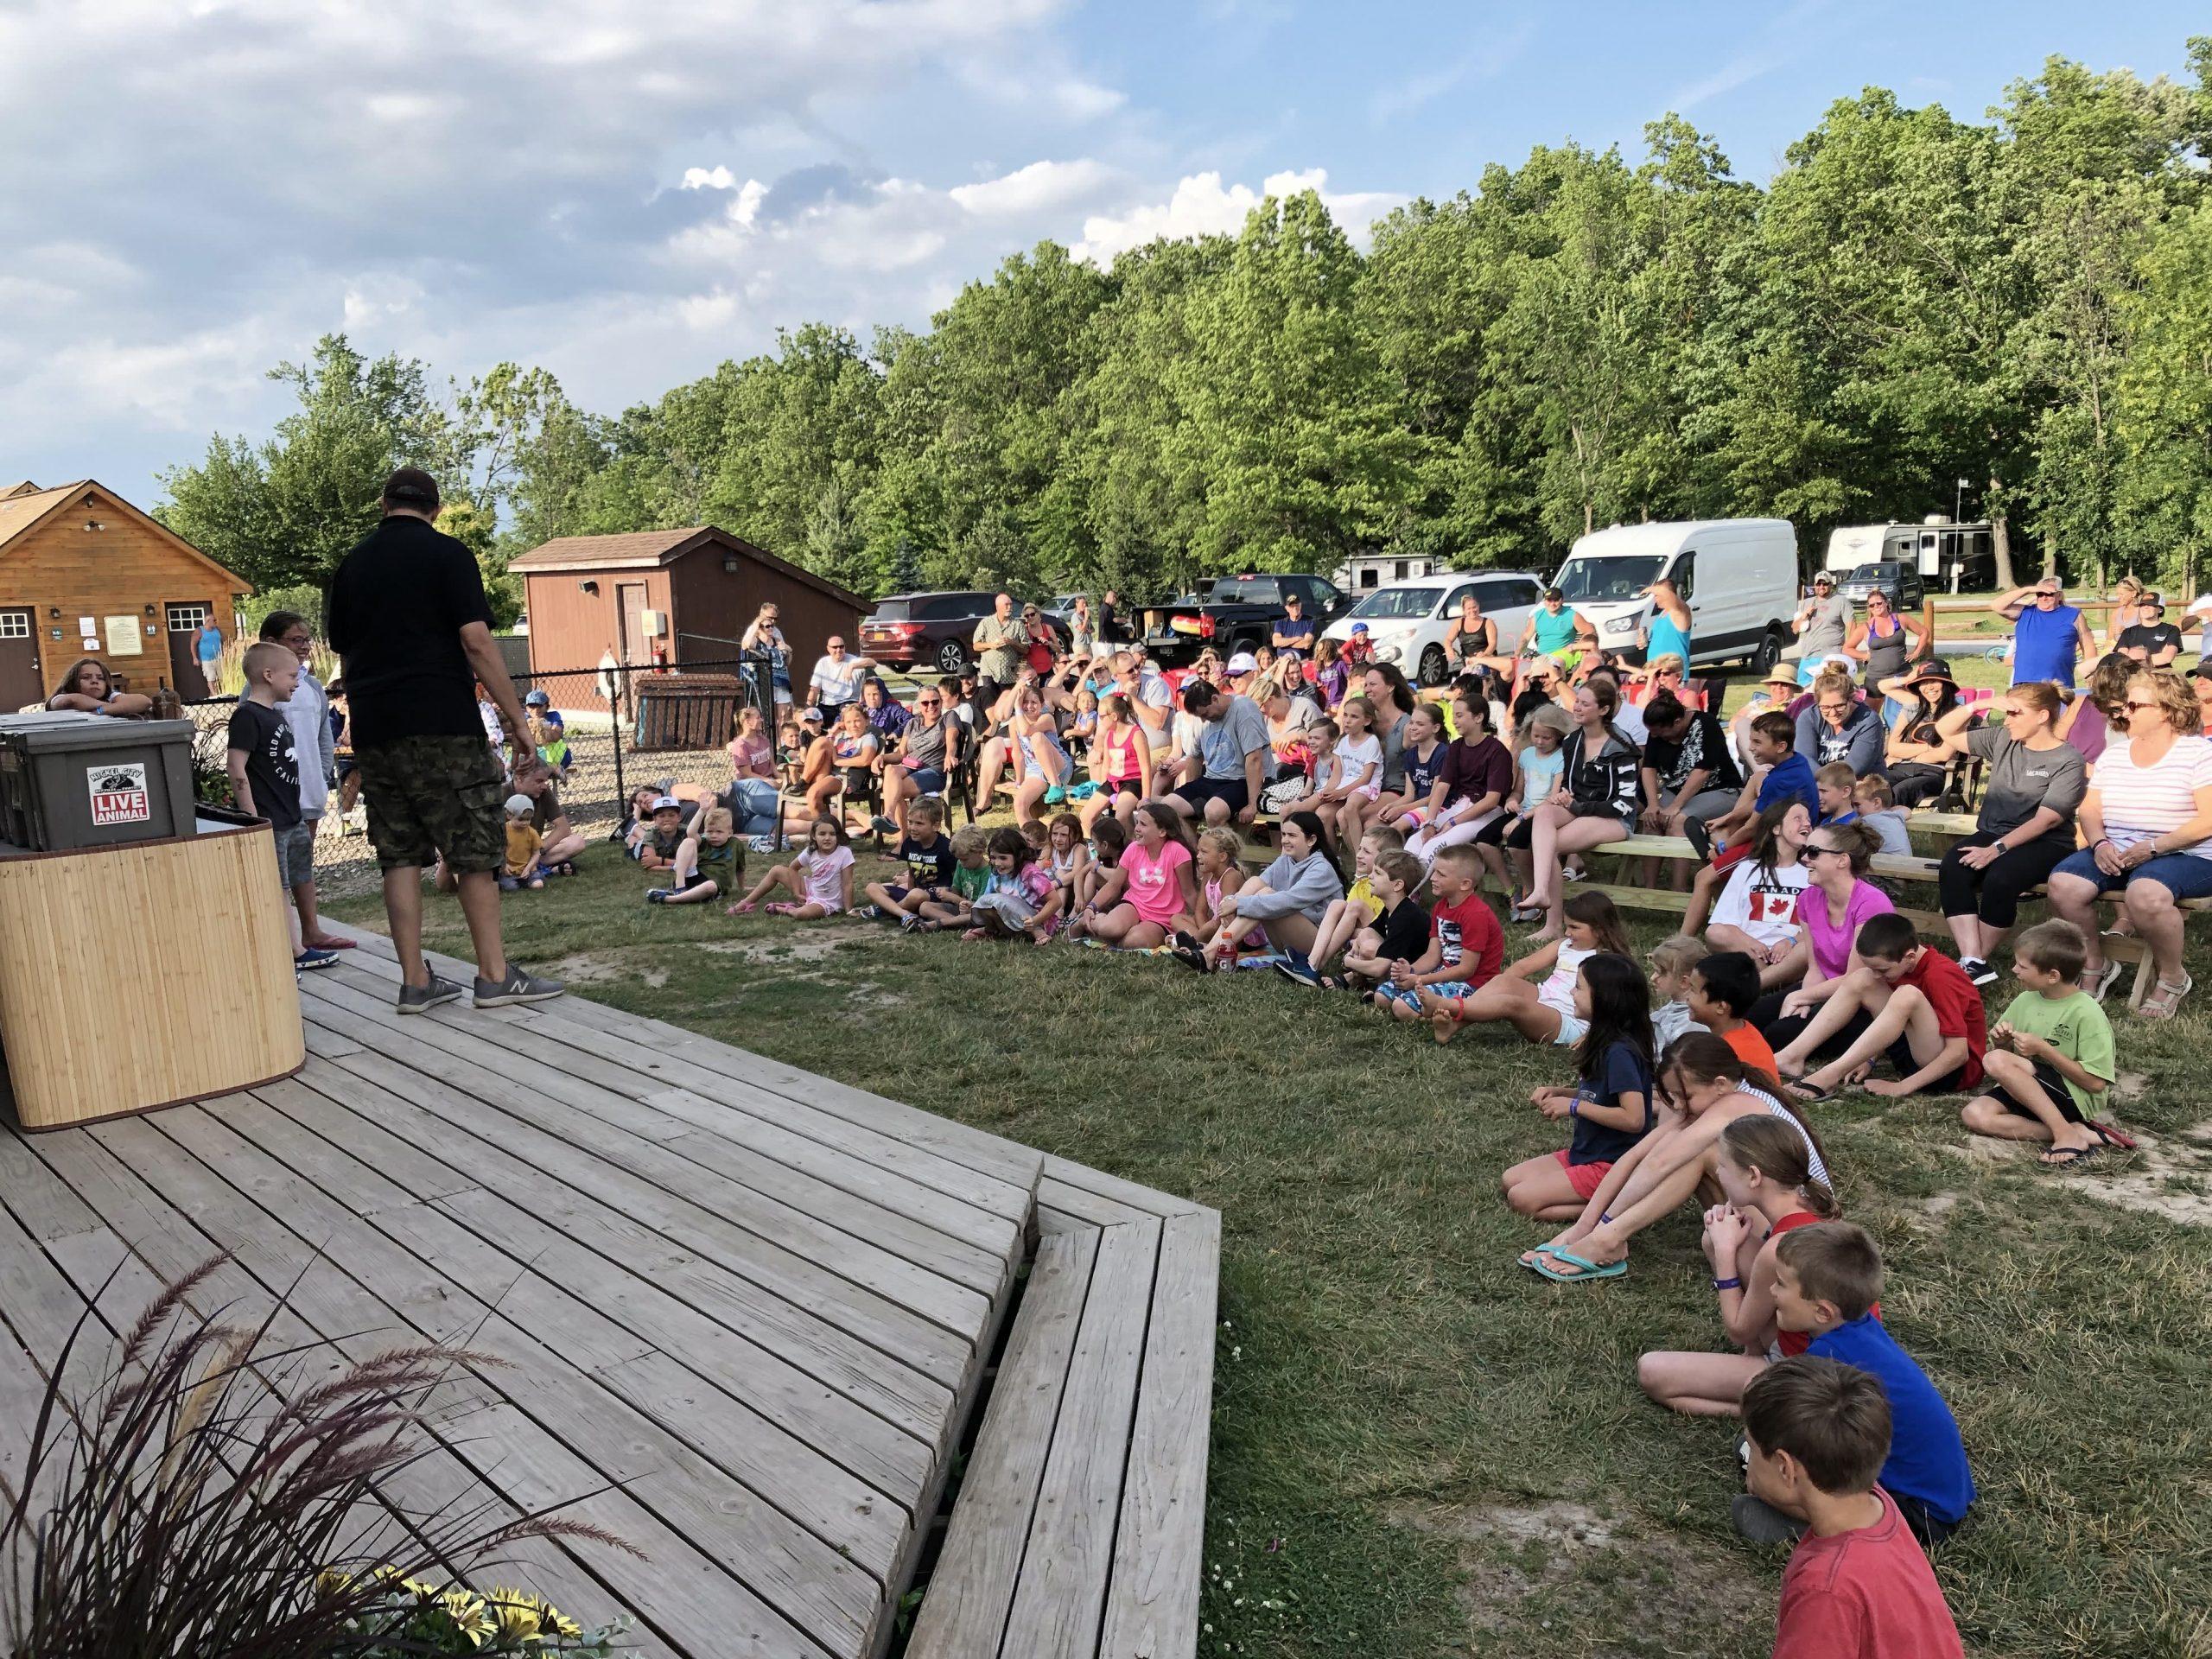 crowd sitting watching nickel city reptile